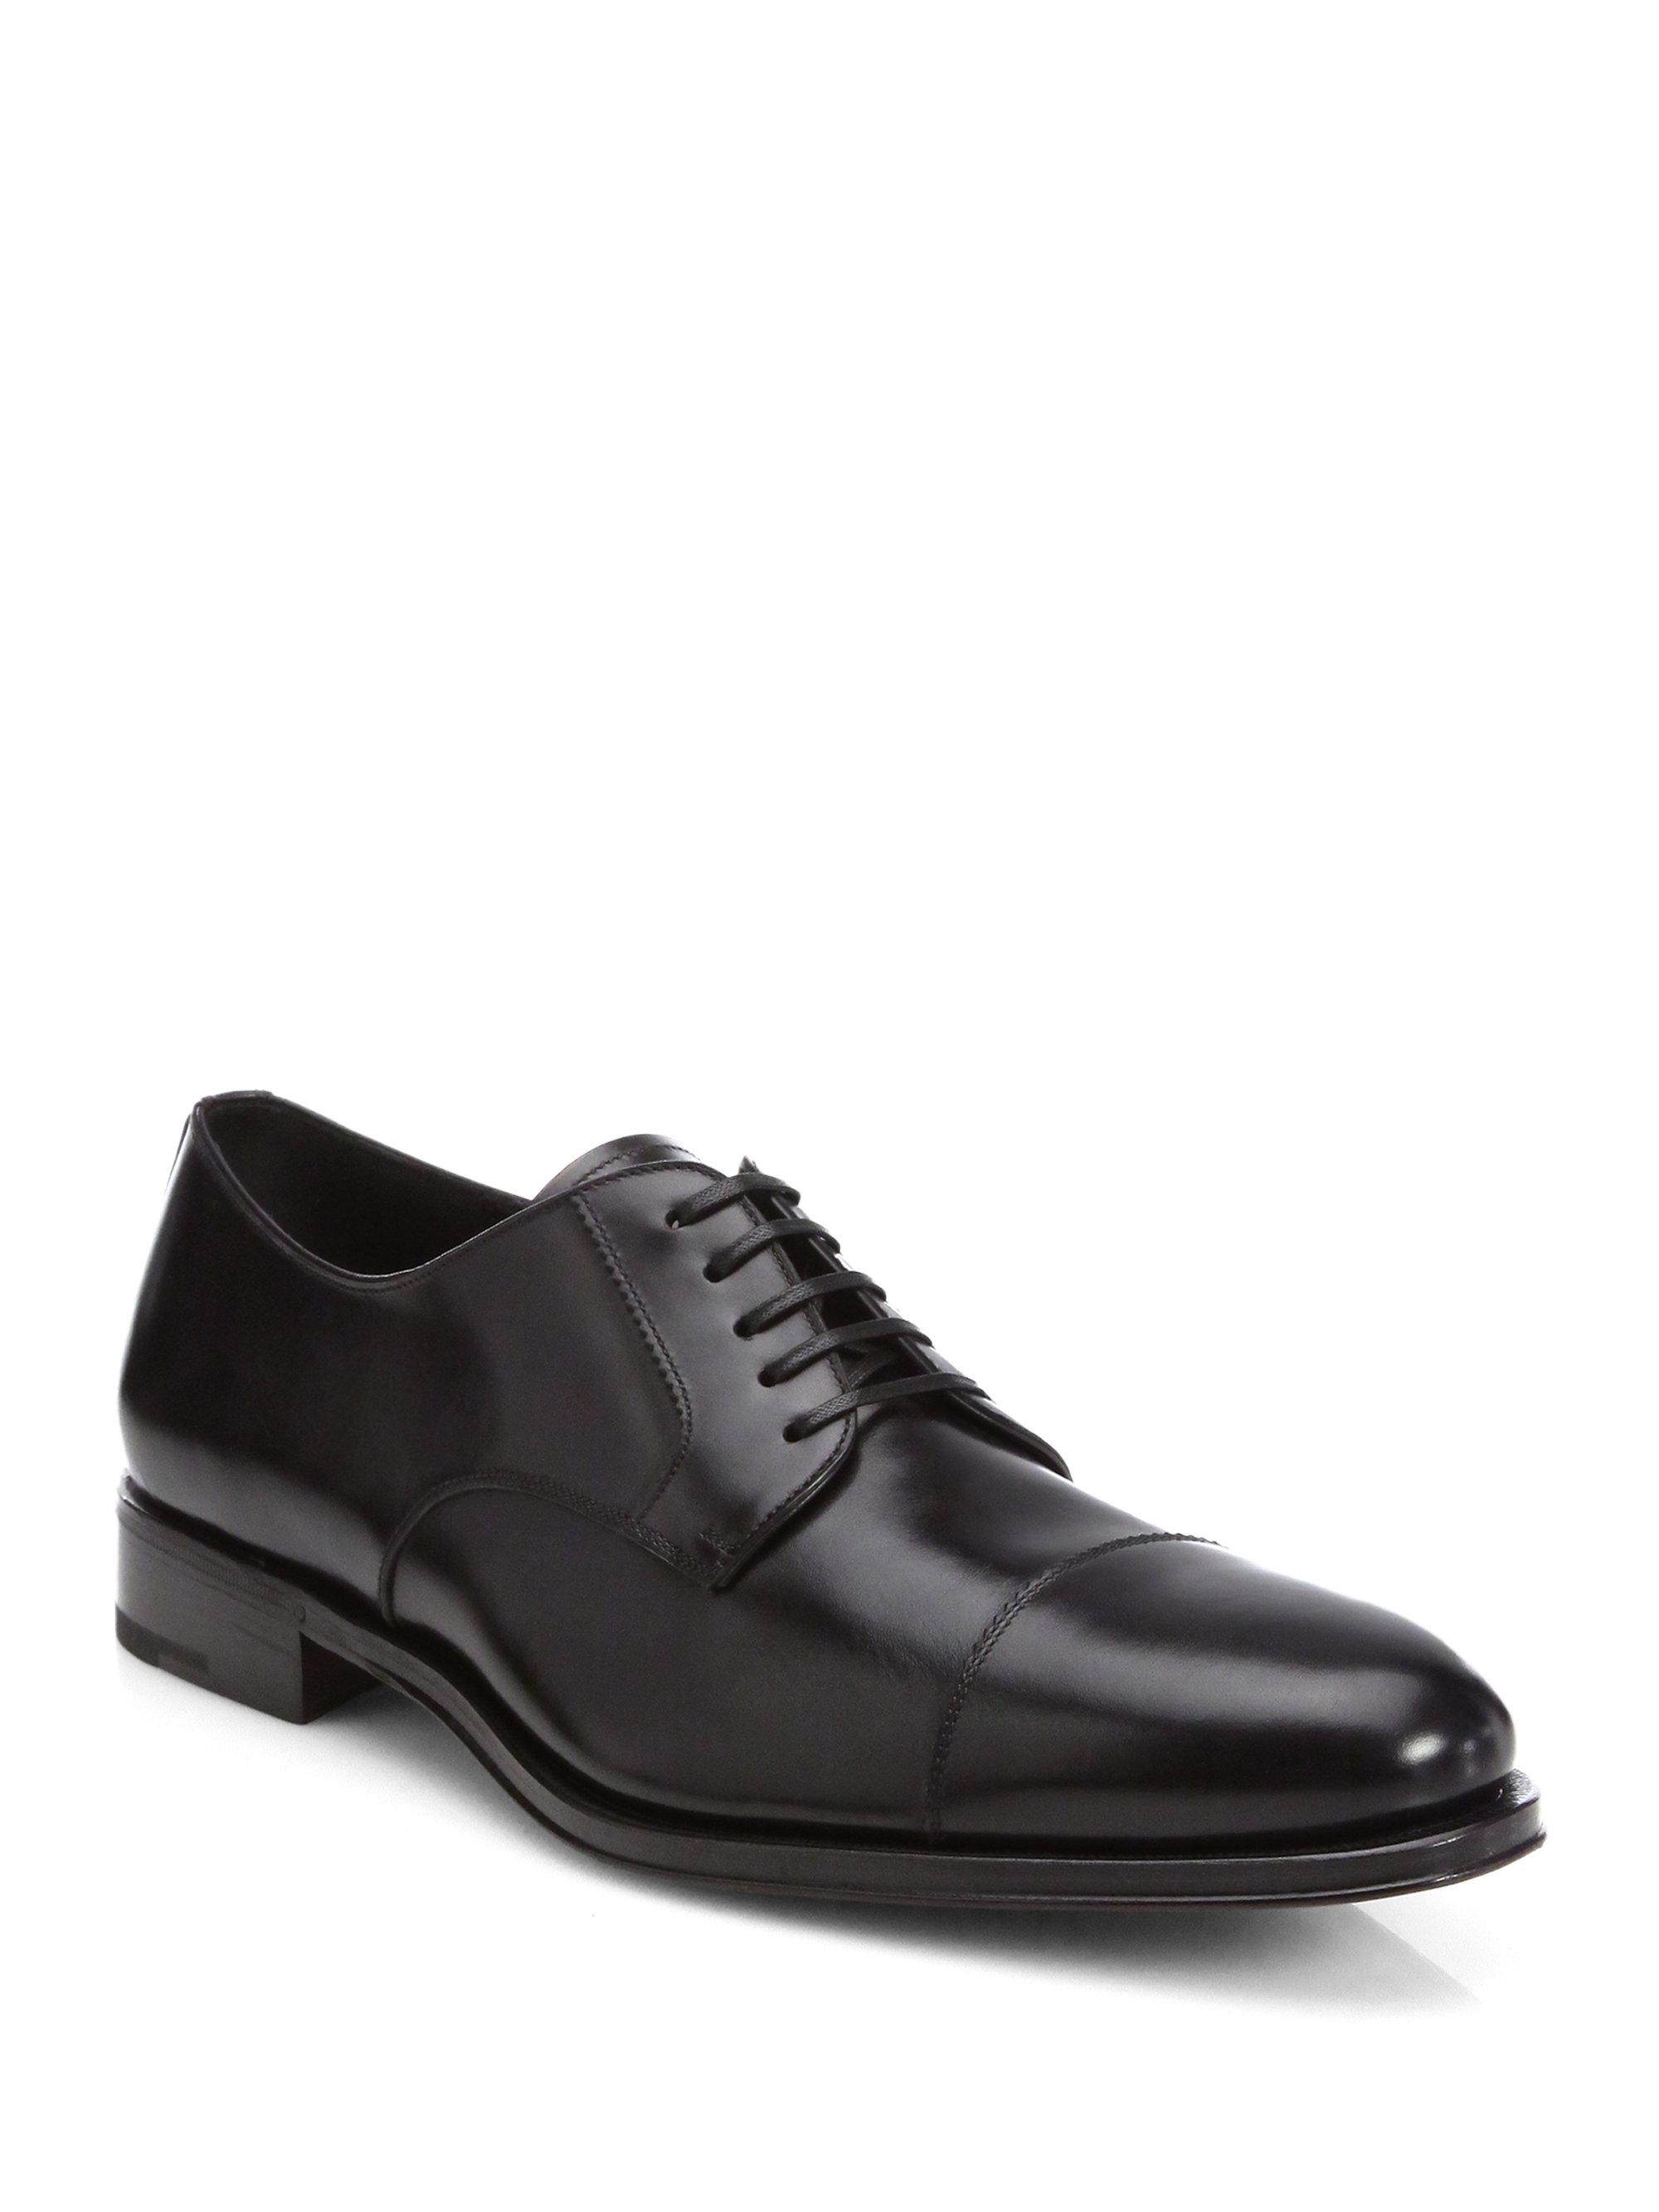 ferragamo rand cap toe derby shoes in black for lyst